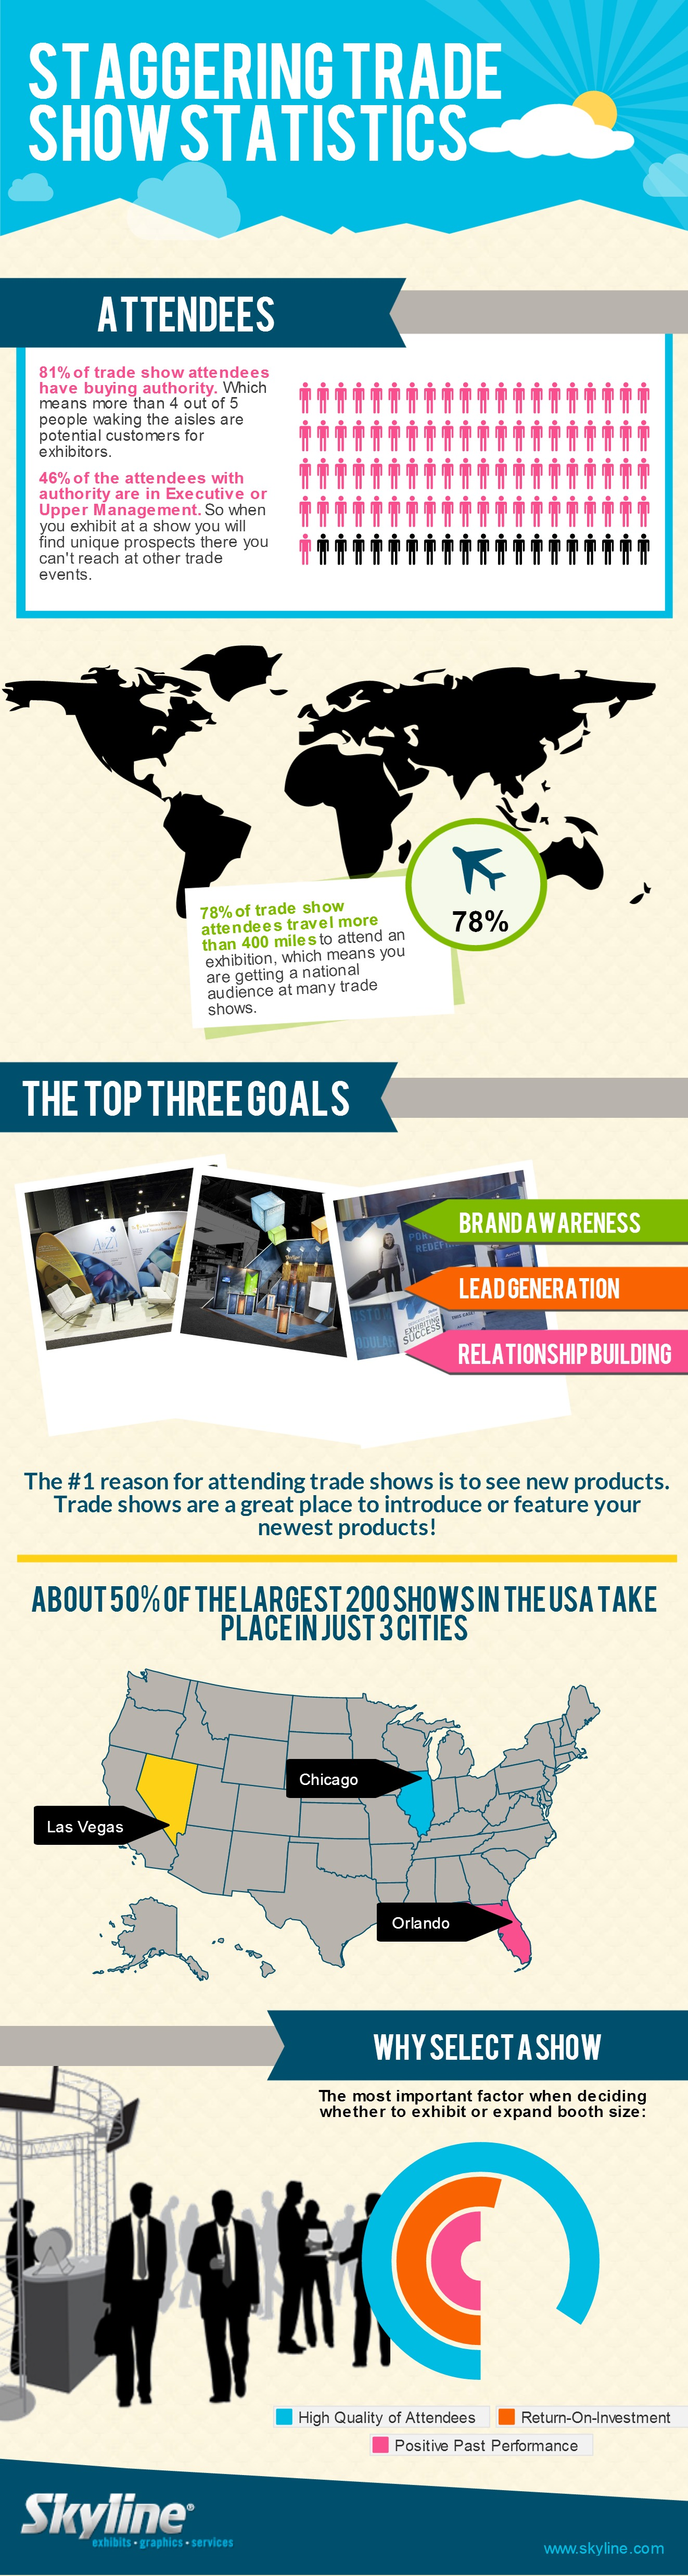 Exhibition Stall Checklist : Staggering trade show statistics skylineexhibits